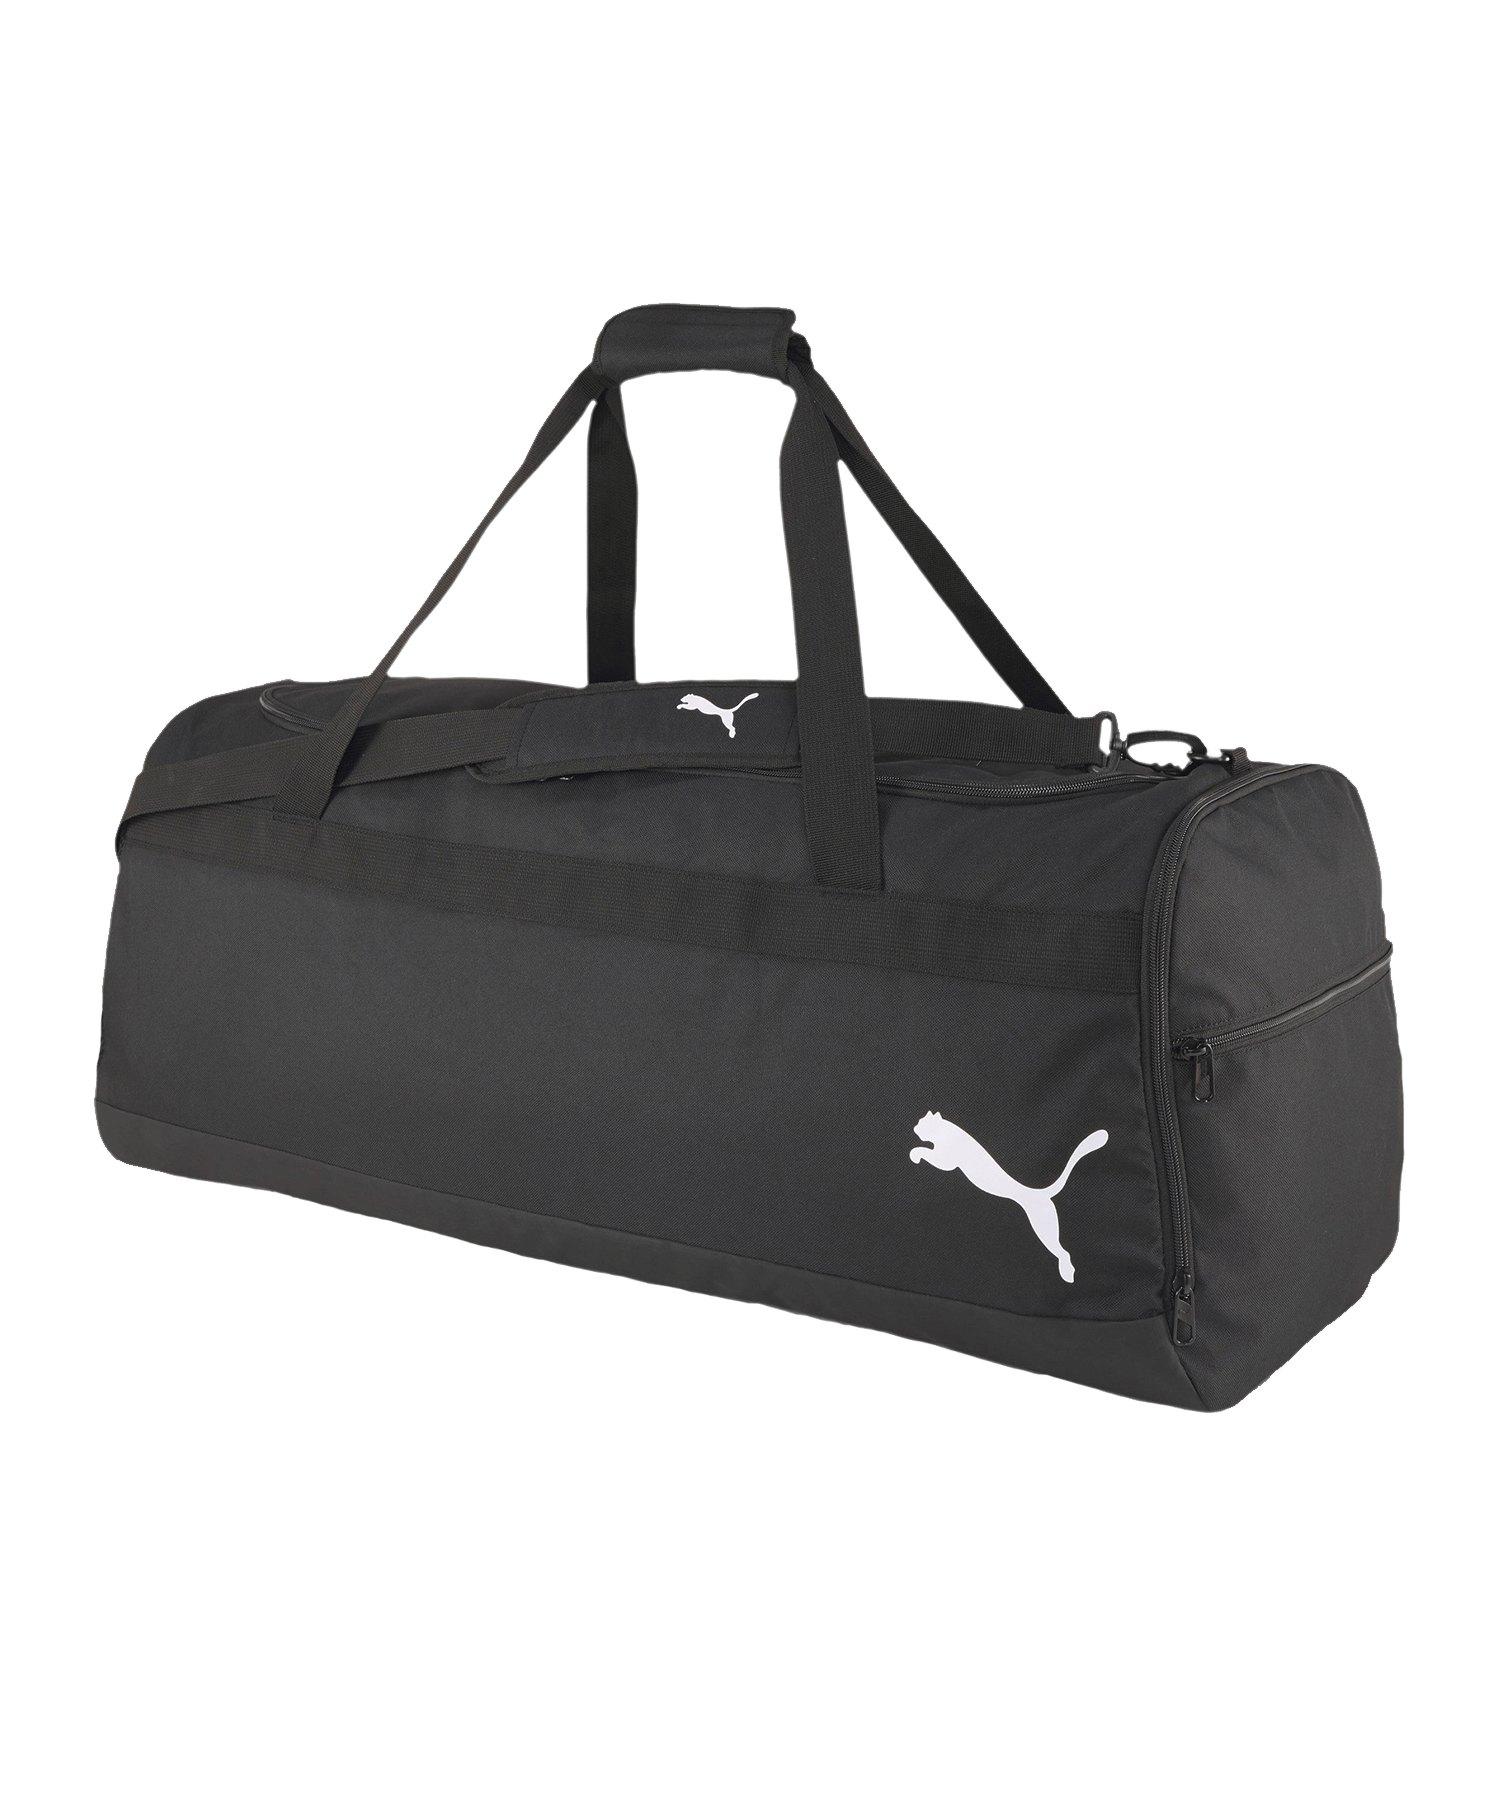 PUMA teamGOAL 23 Teambag Sporttasche GR. L F03 - schwarz